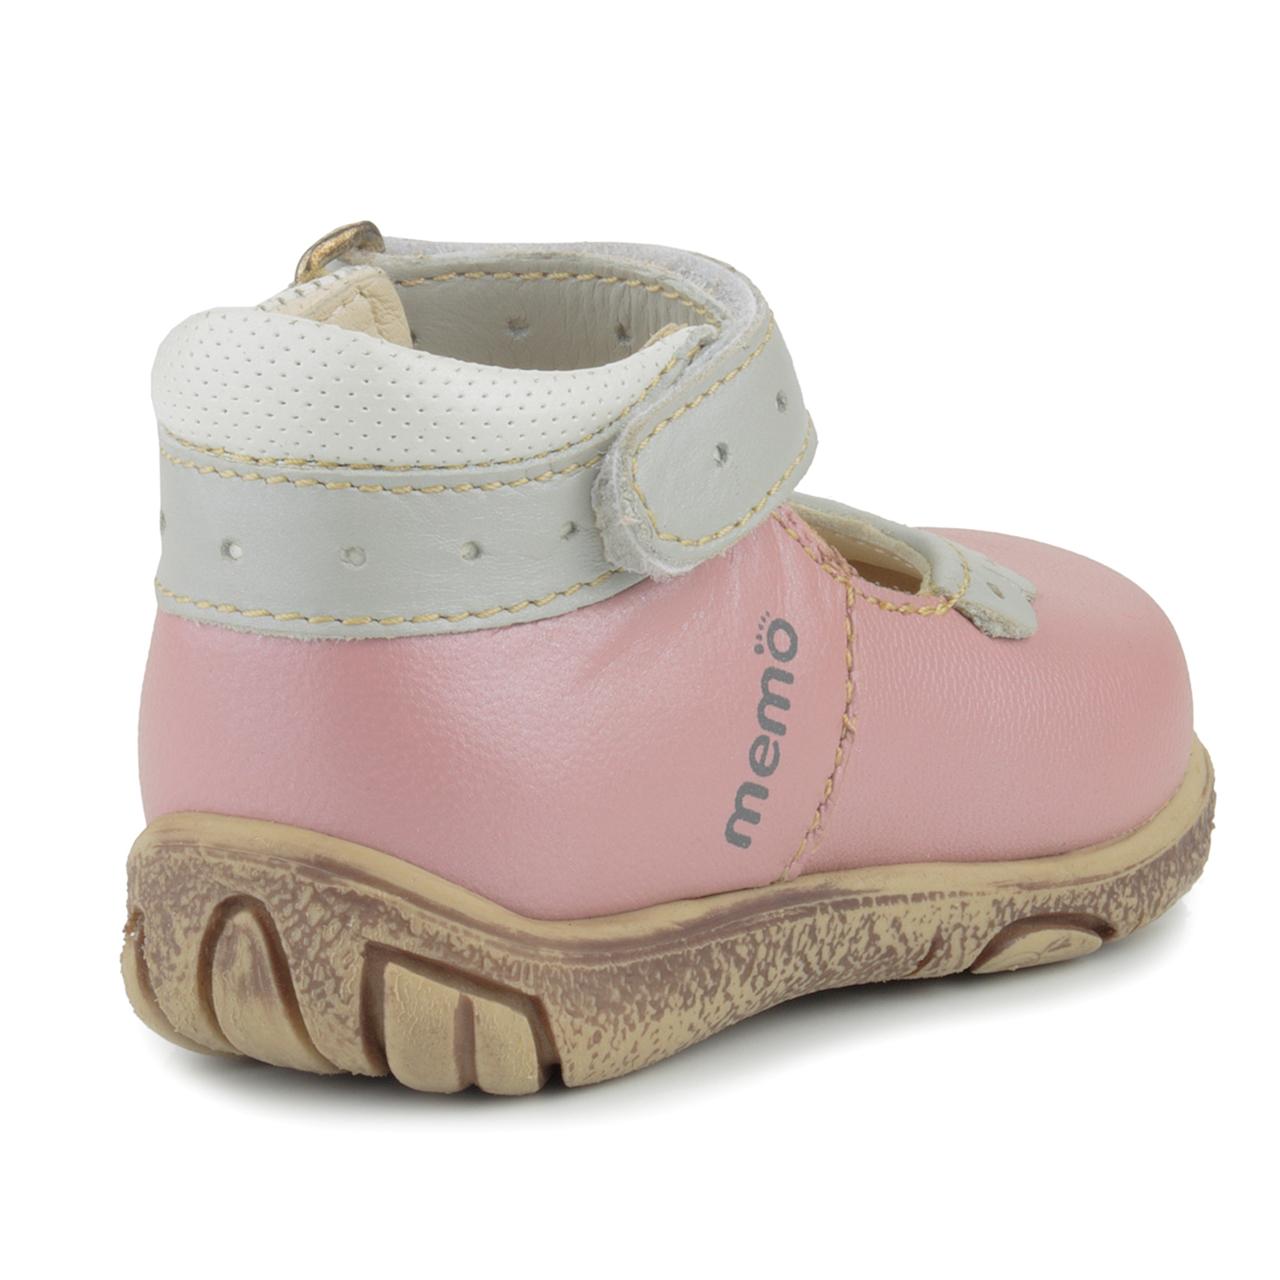 Shoes For Walking Baby - Style Guru: Fashion, Glitz ...